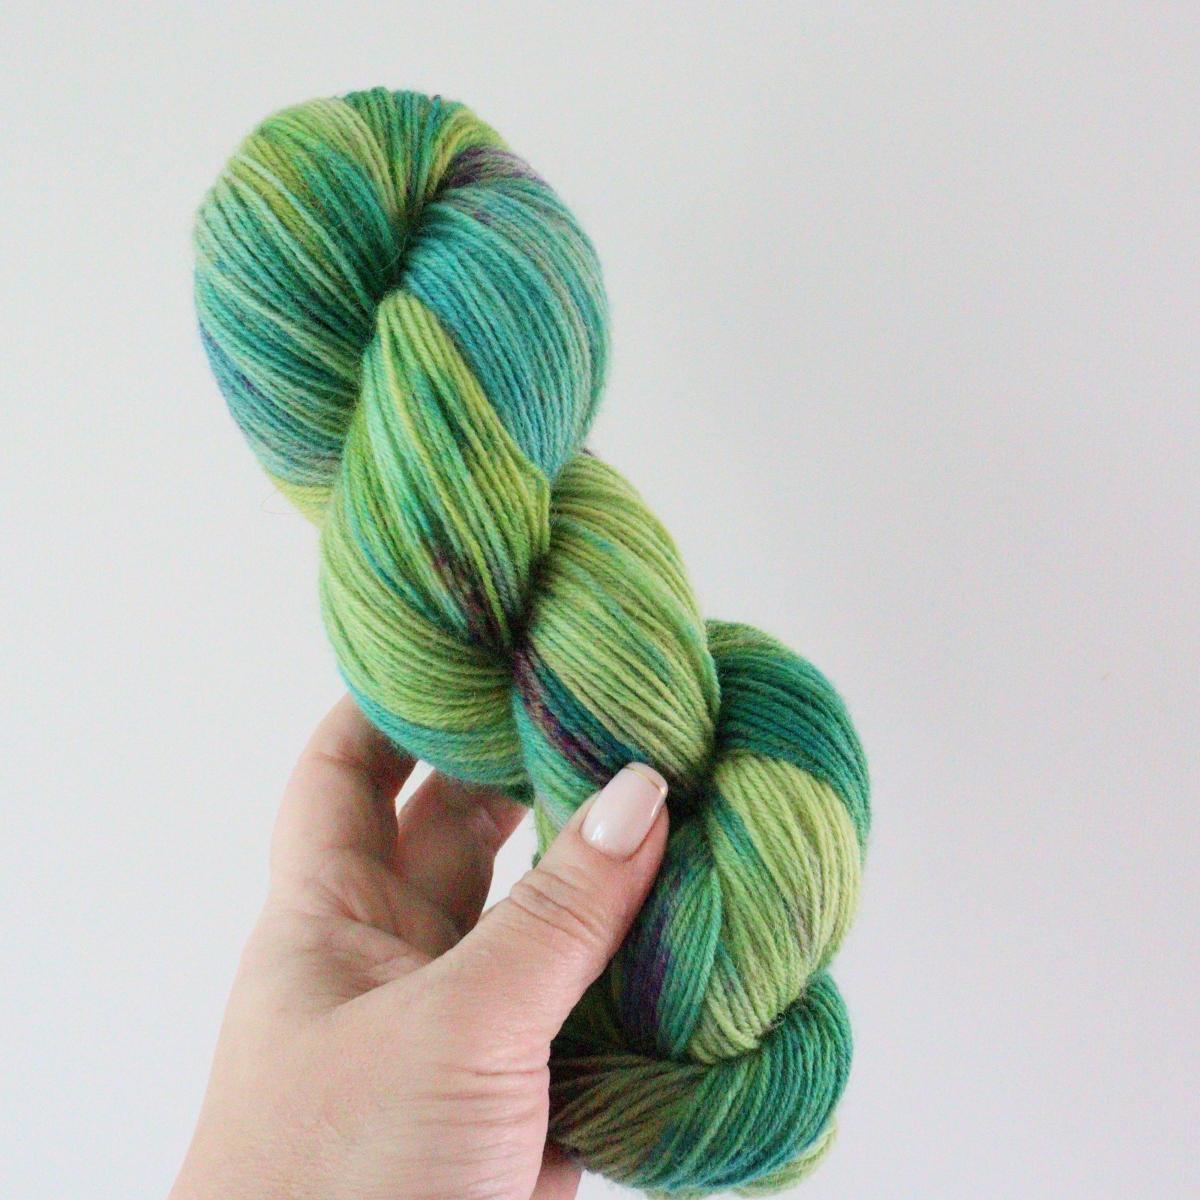 woodico.pro hand dyed yarn 080 3 1200x1200 - Hand dyed yarn / 080